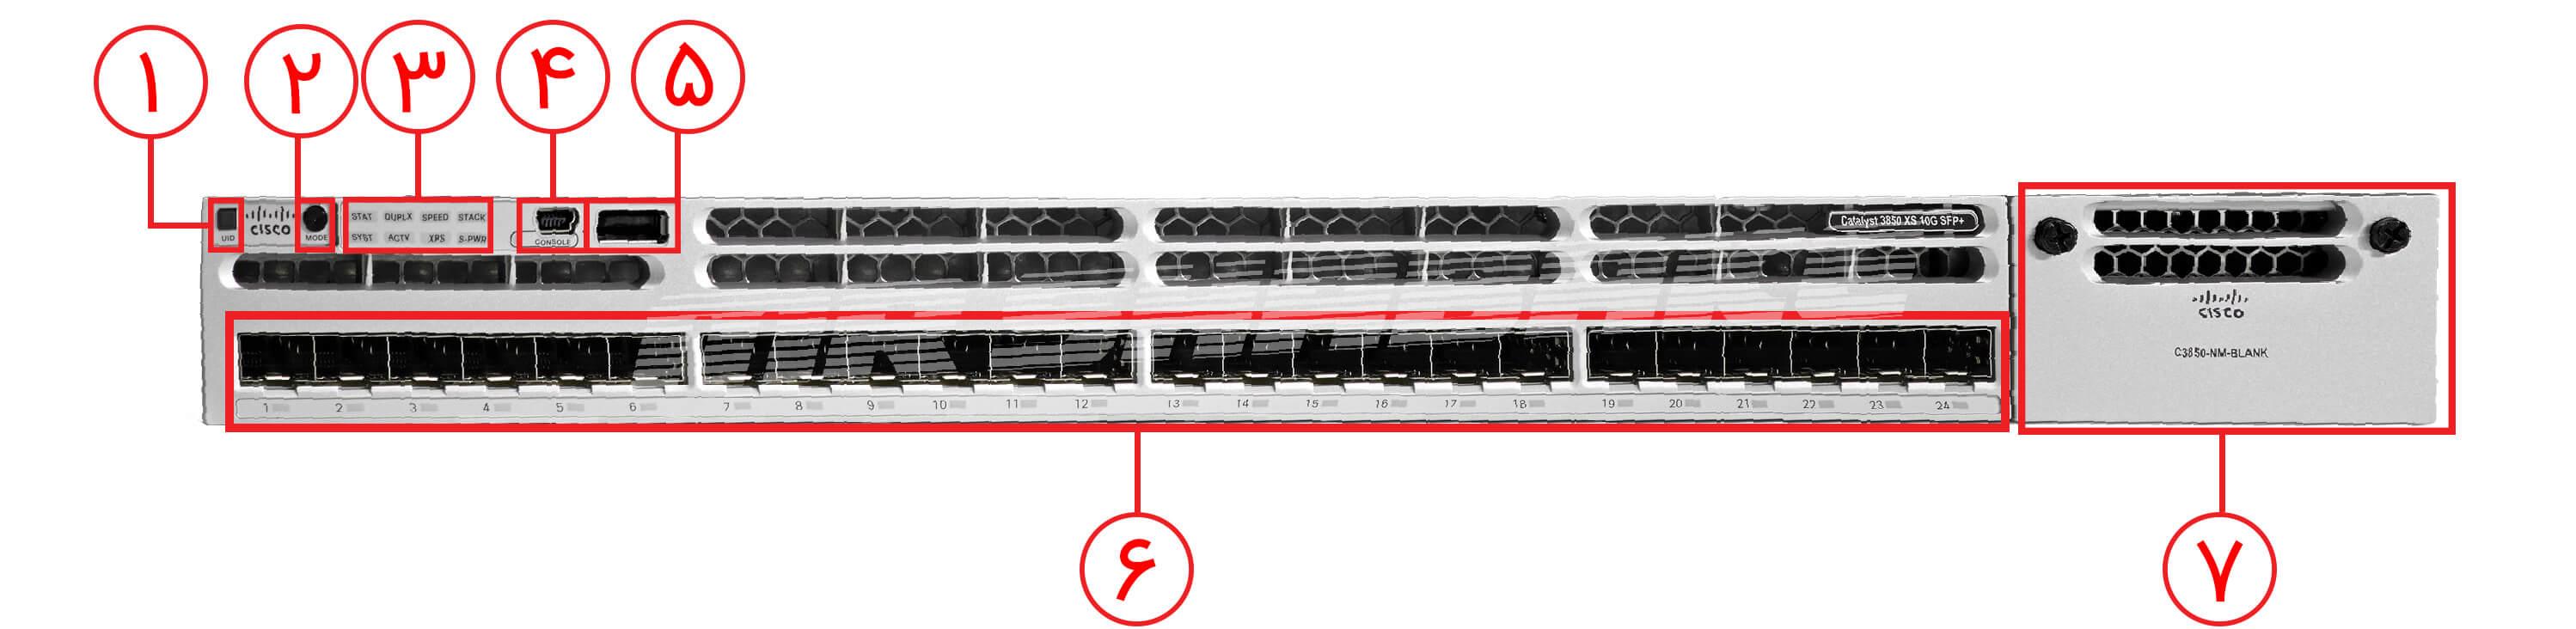 سوئیچ سیسکو مدل WS-C3850-24XS-S